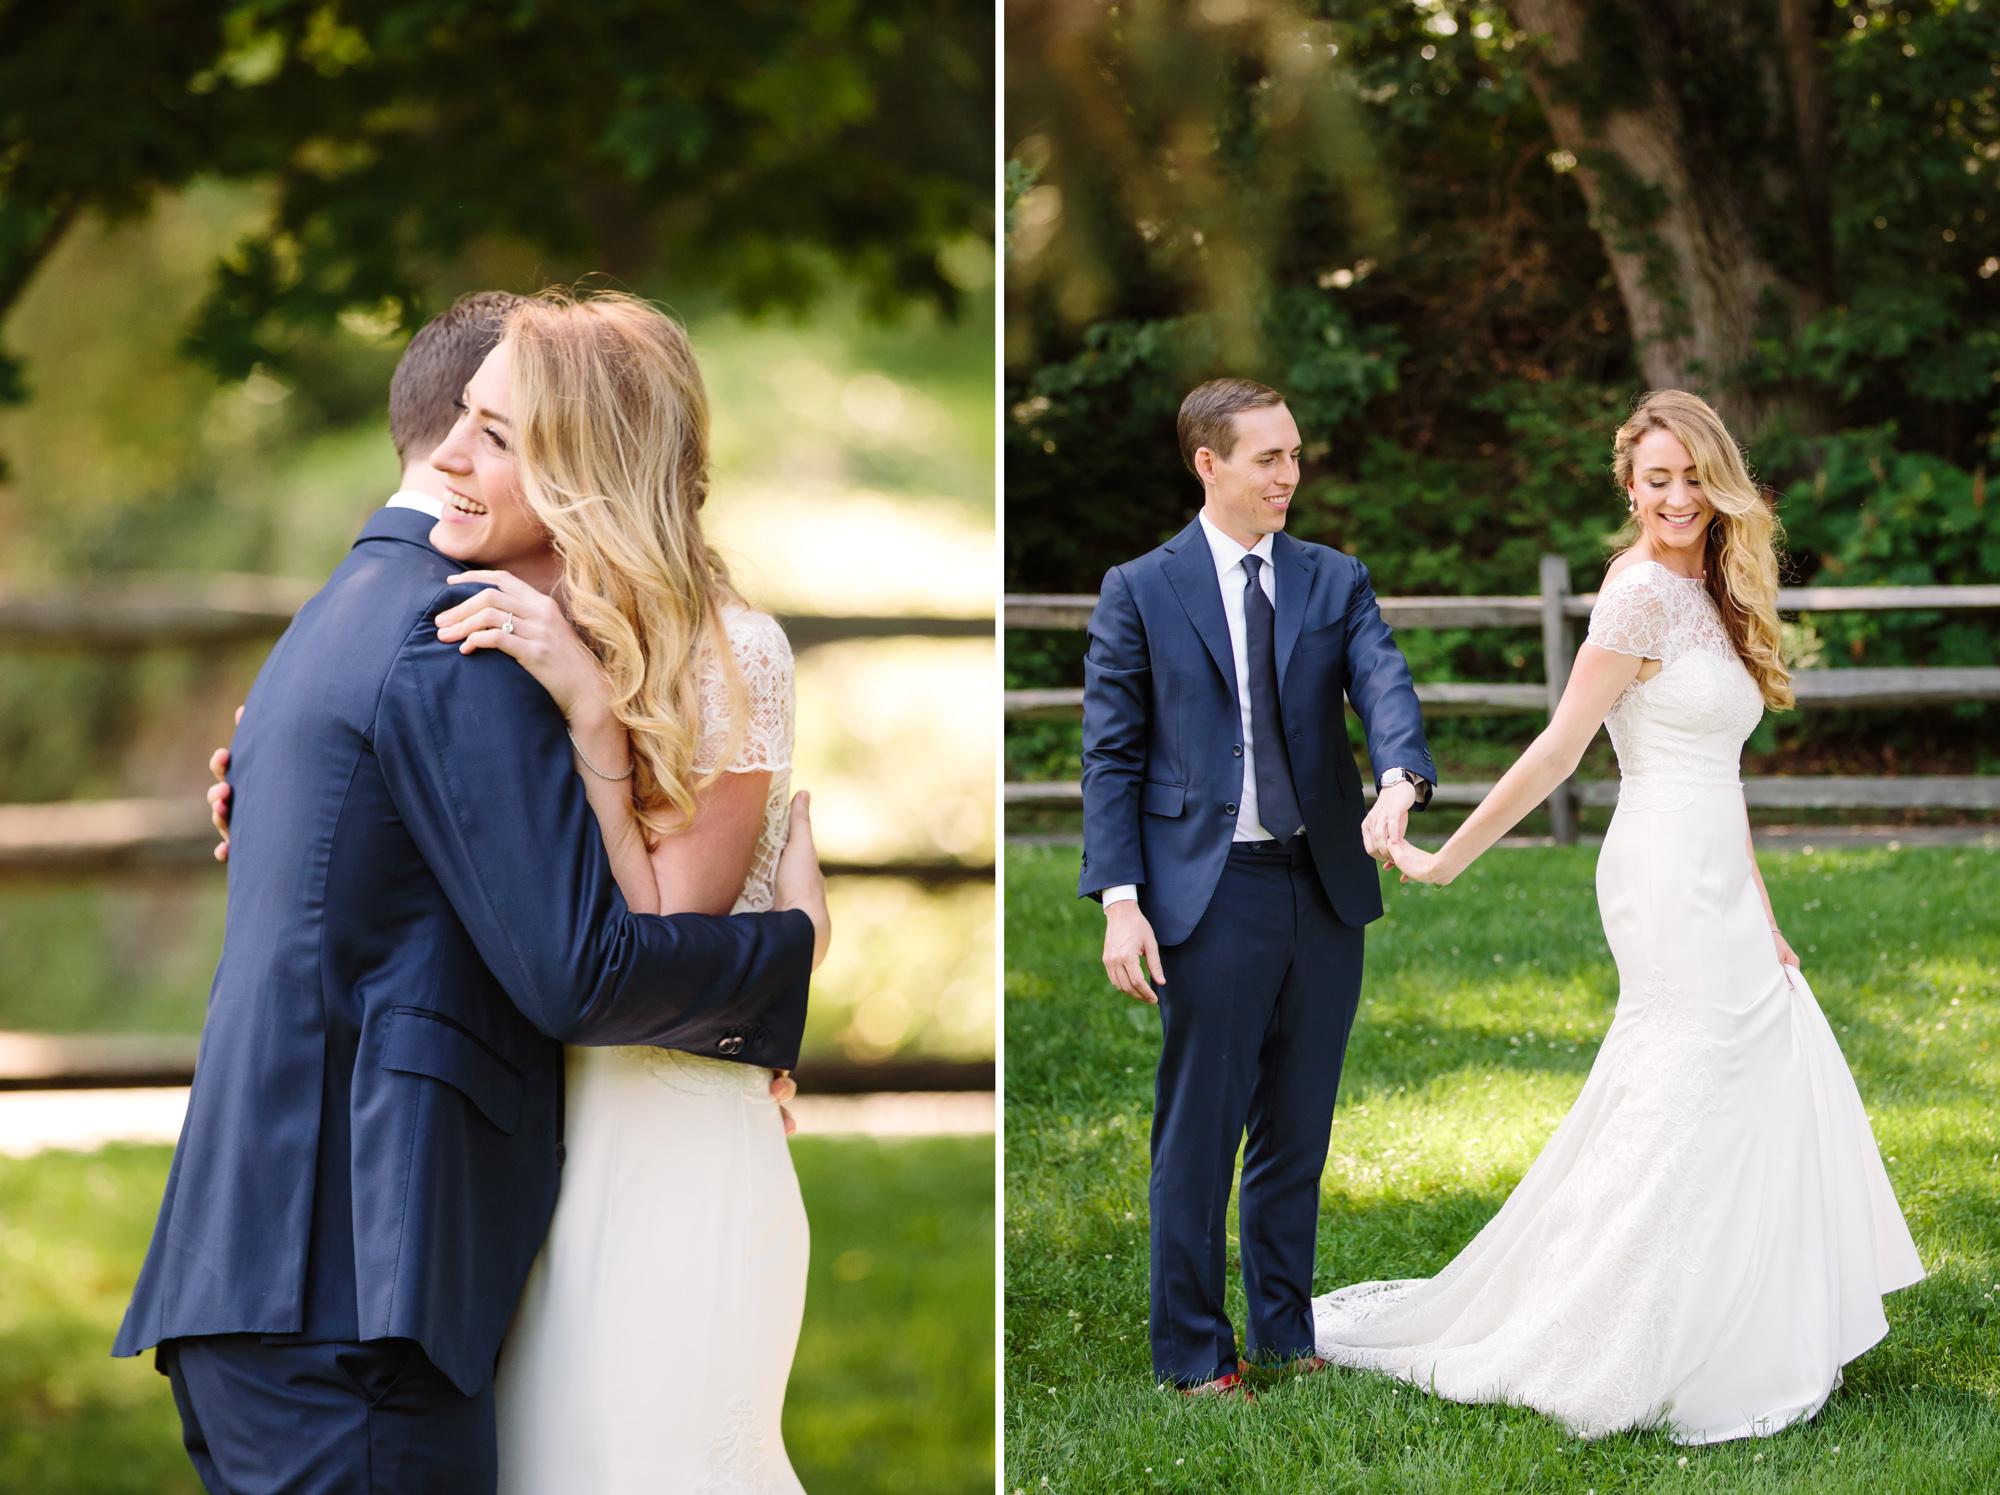 15_Jessica_Ted_Blue_Hill_Stone_Barns_Wedding_Pocantico_NY_Tanya_Salazar_Photography.jpg